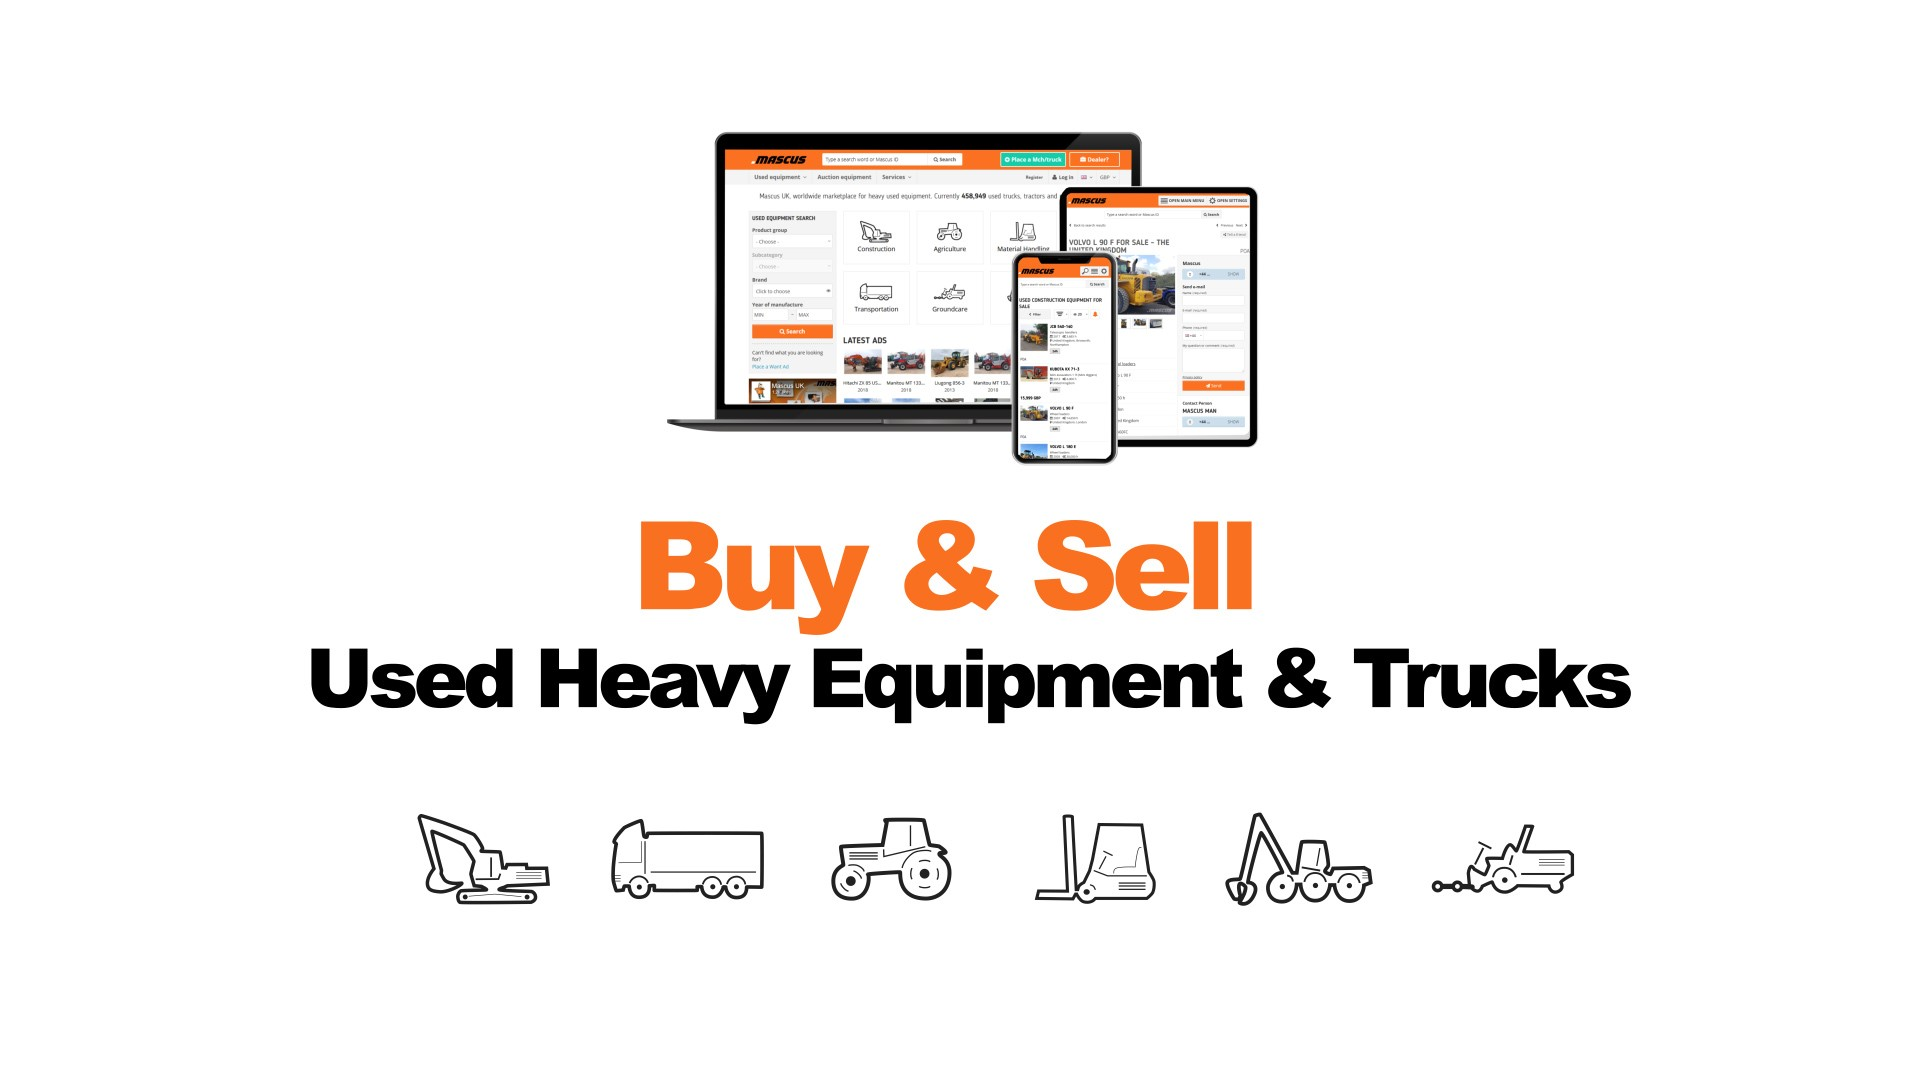 Mascus – Buy & Sell Used Heavy Equipment & Trucks